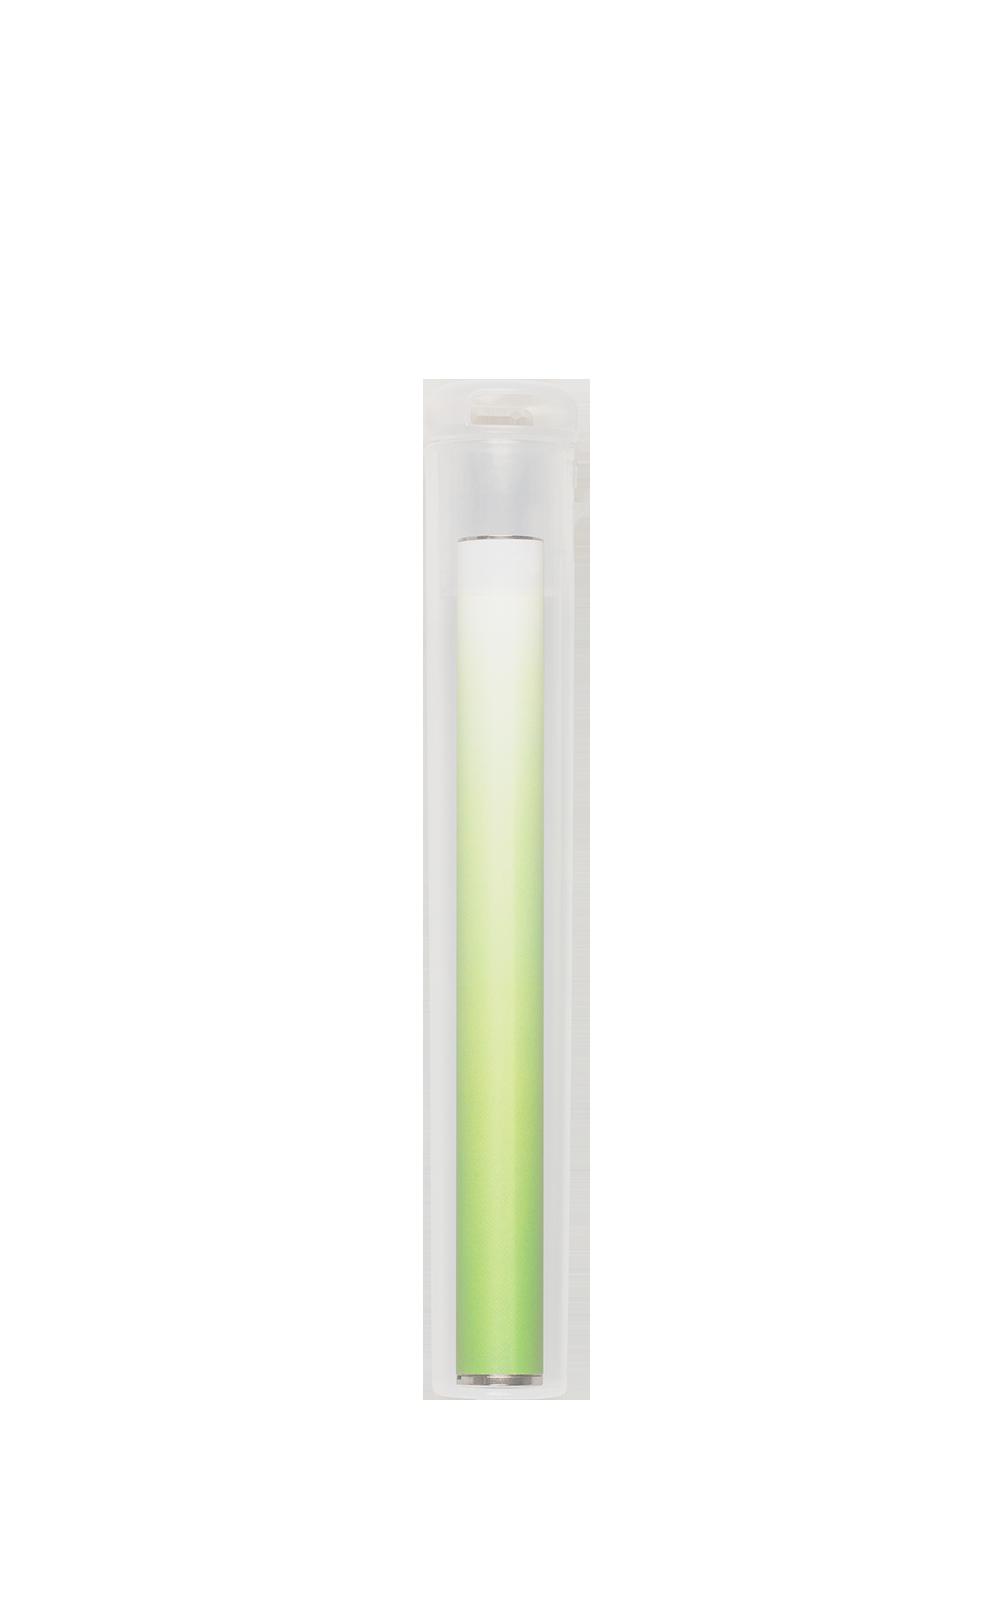 crpak-tube-110-Side-Vape.png